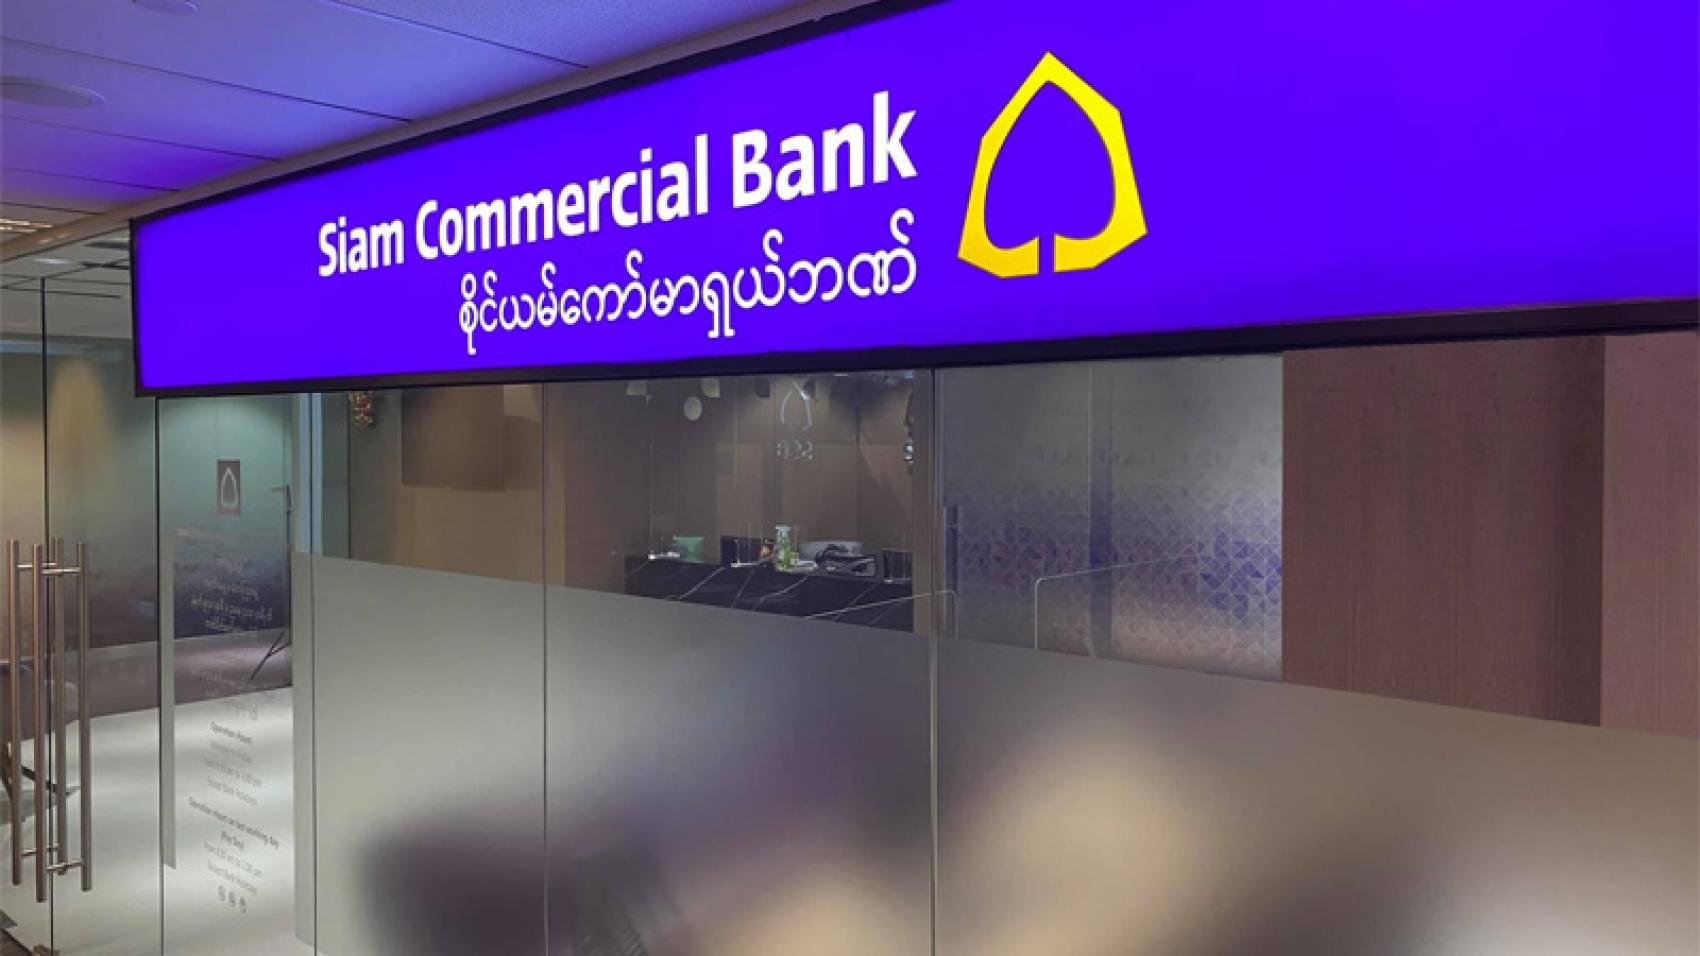 siam-commercial-bank-opens-in-myanmar